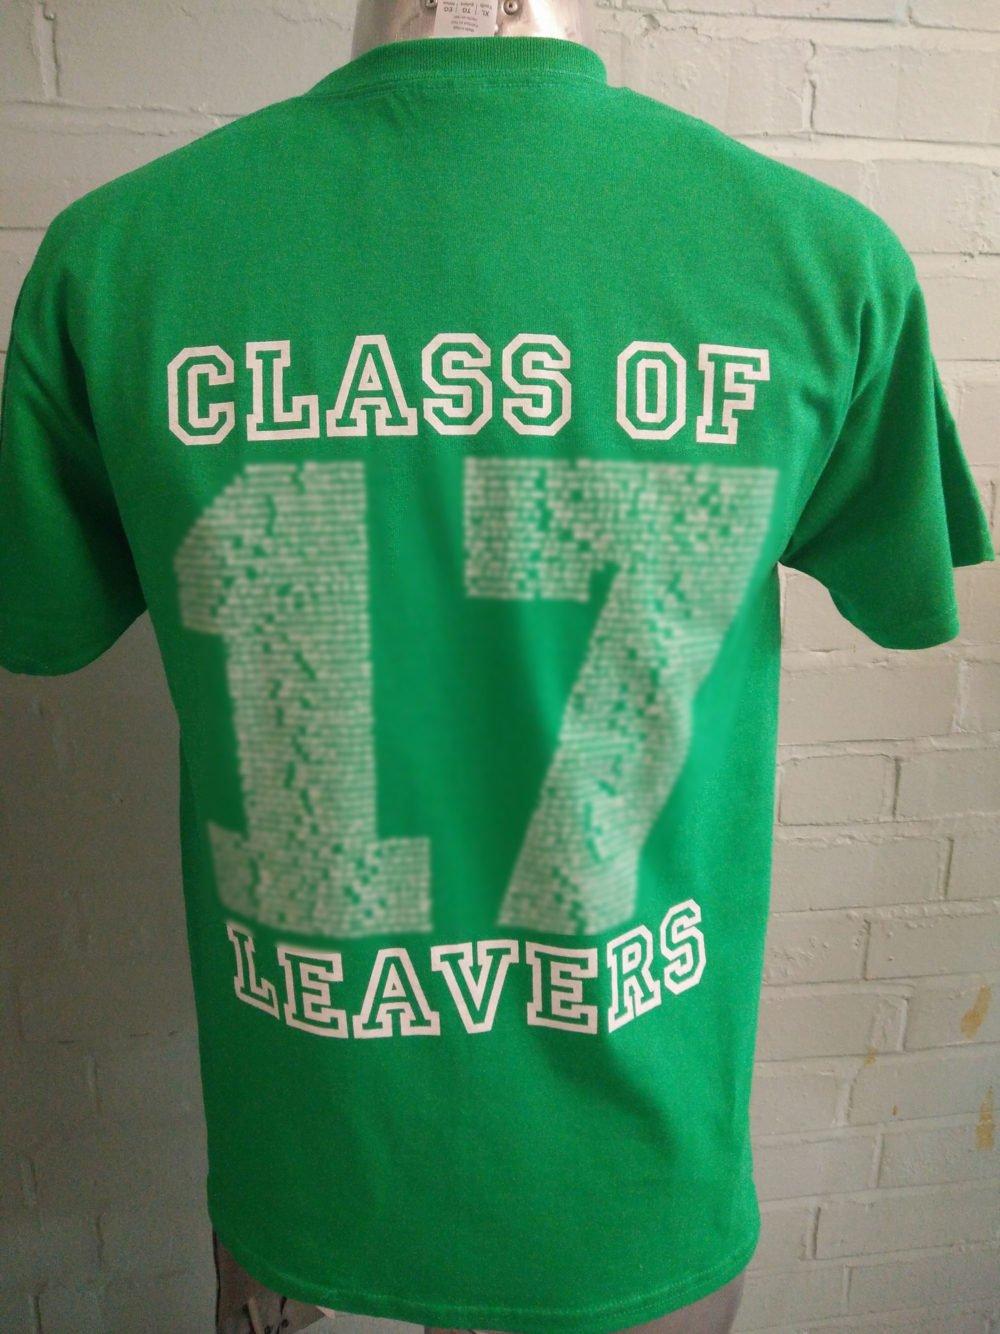 Greenside Primary School Leavers T-Shirts 2017